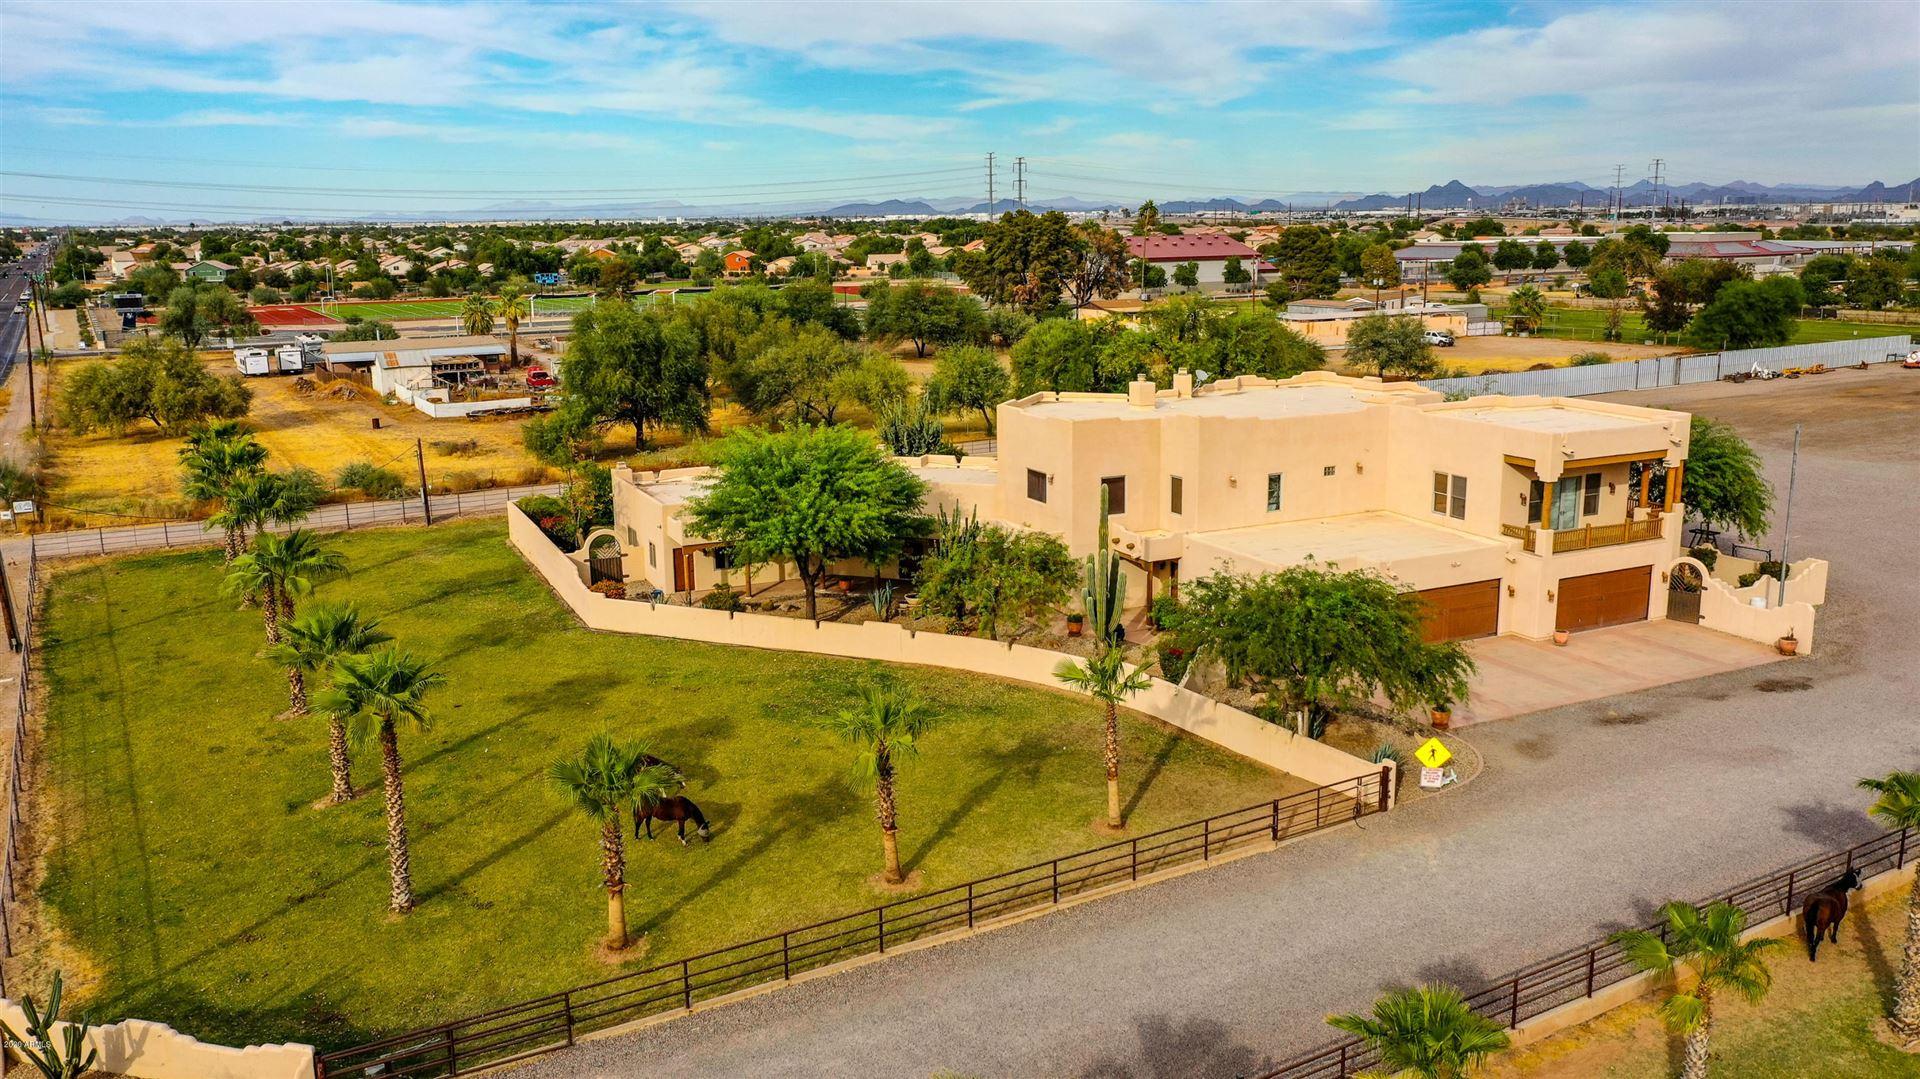 3833 S 67th Avenue, Phoenix, AZ 85043 - MLS#: 6158278